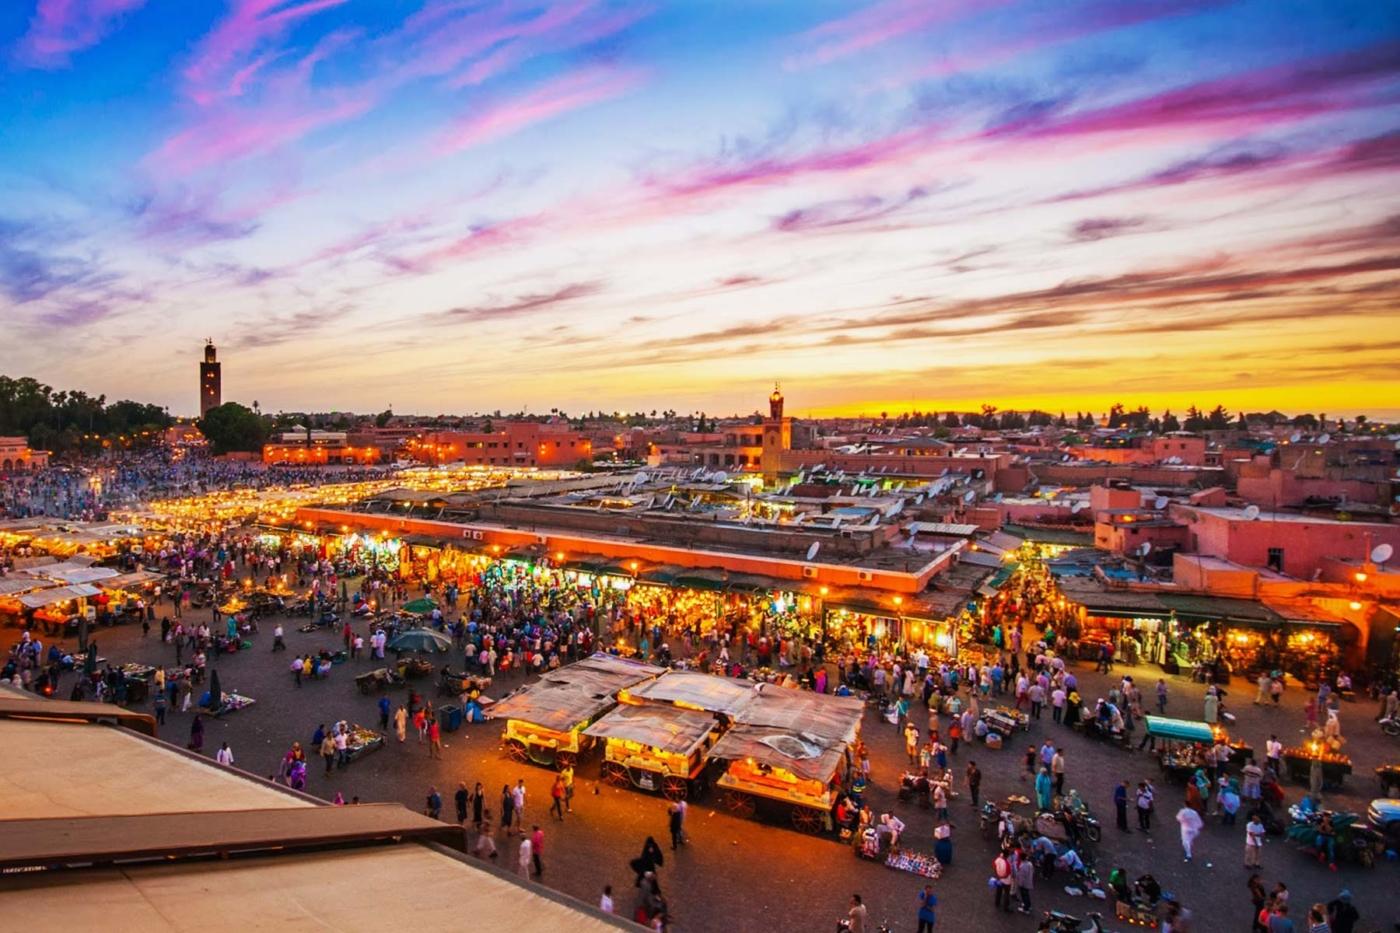 jamaa-lafna-Marrakech